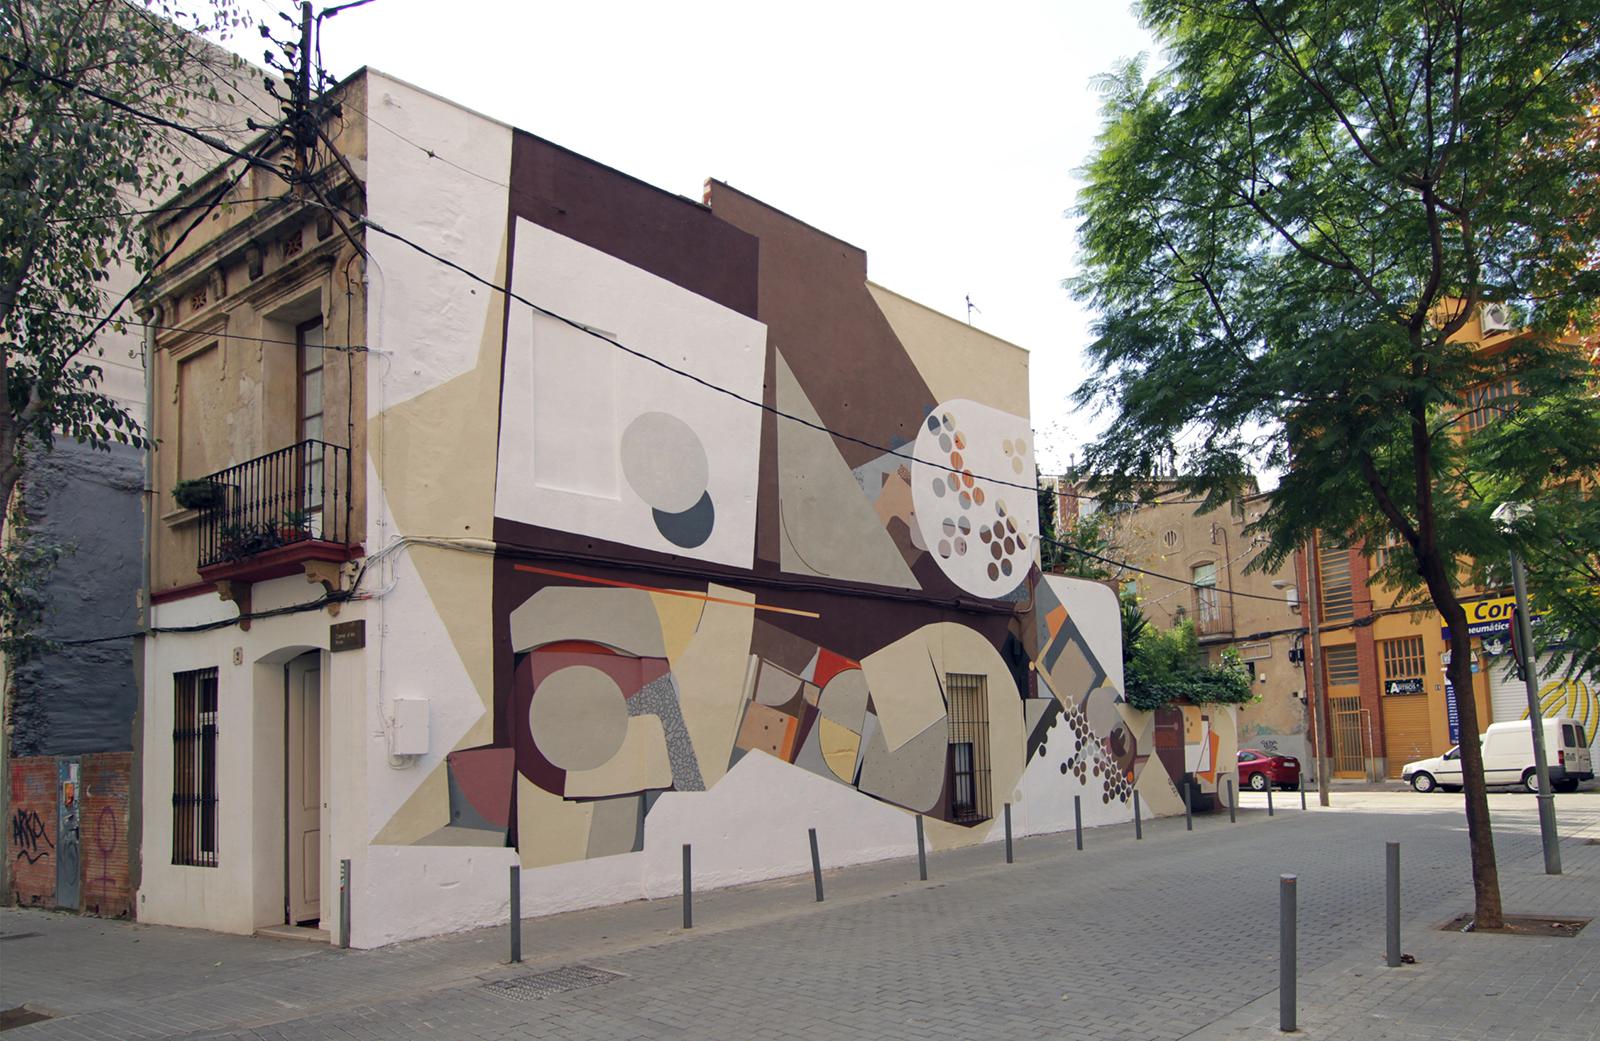 spogo-new-mural-for-openwalls-barcelona-01